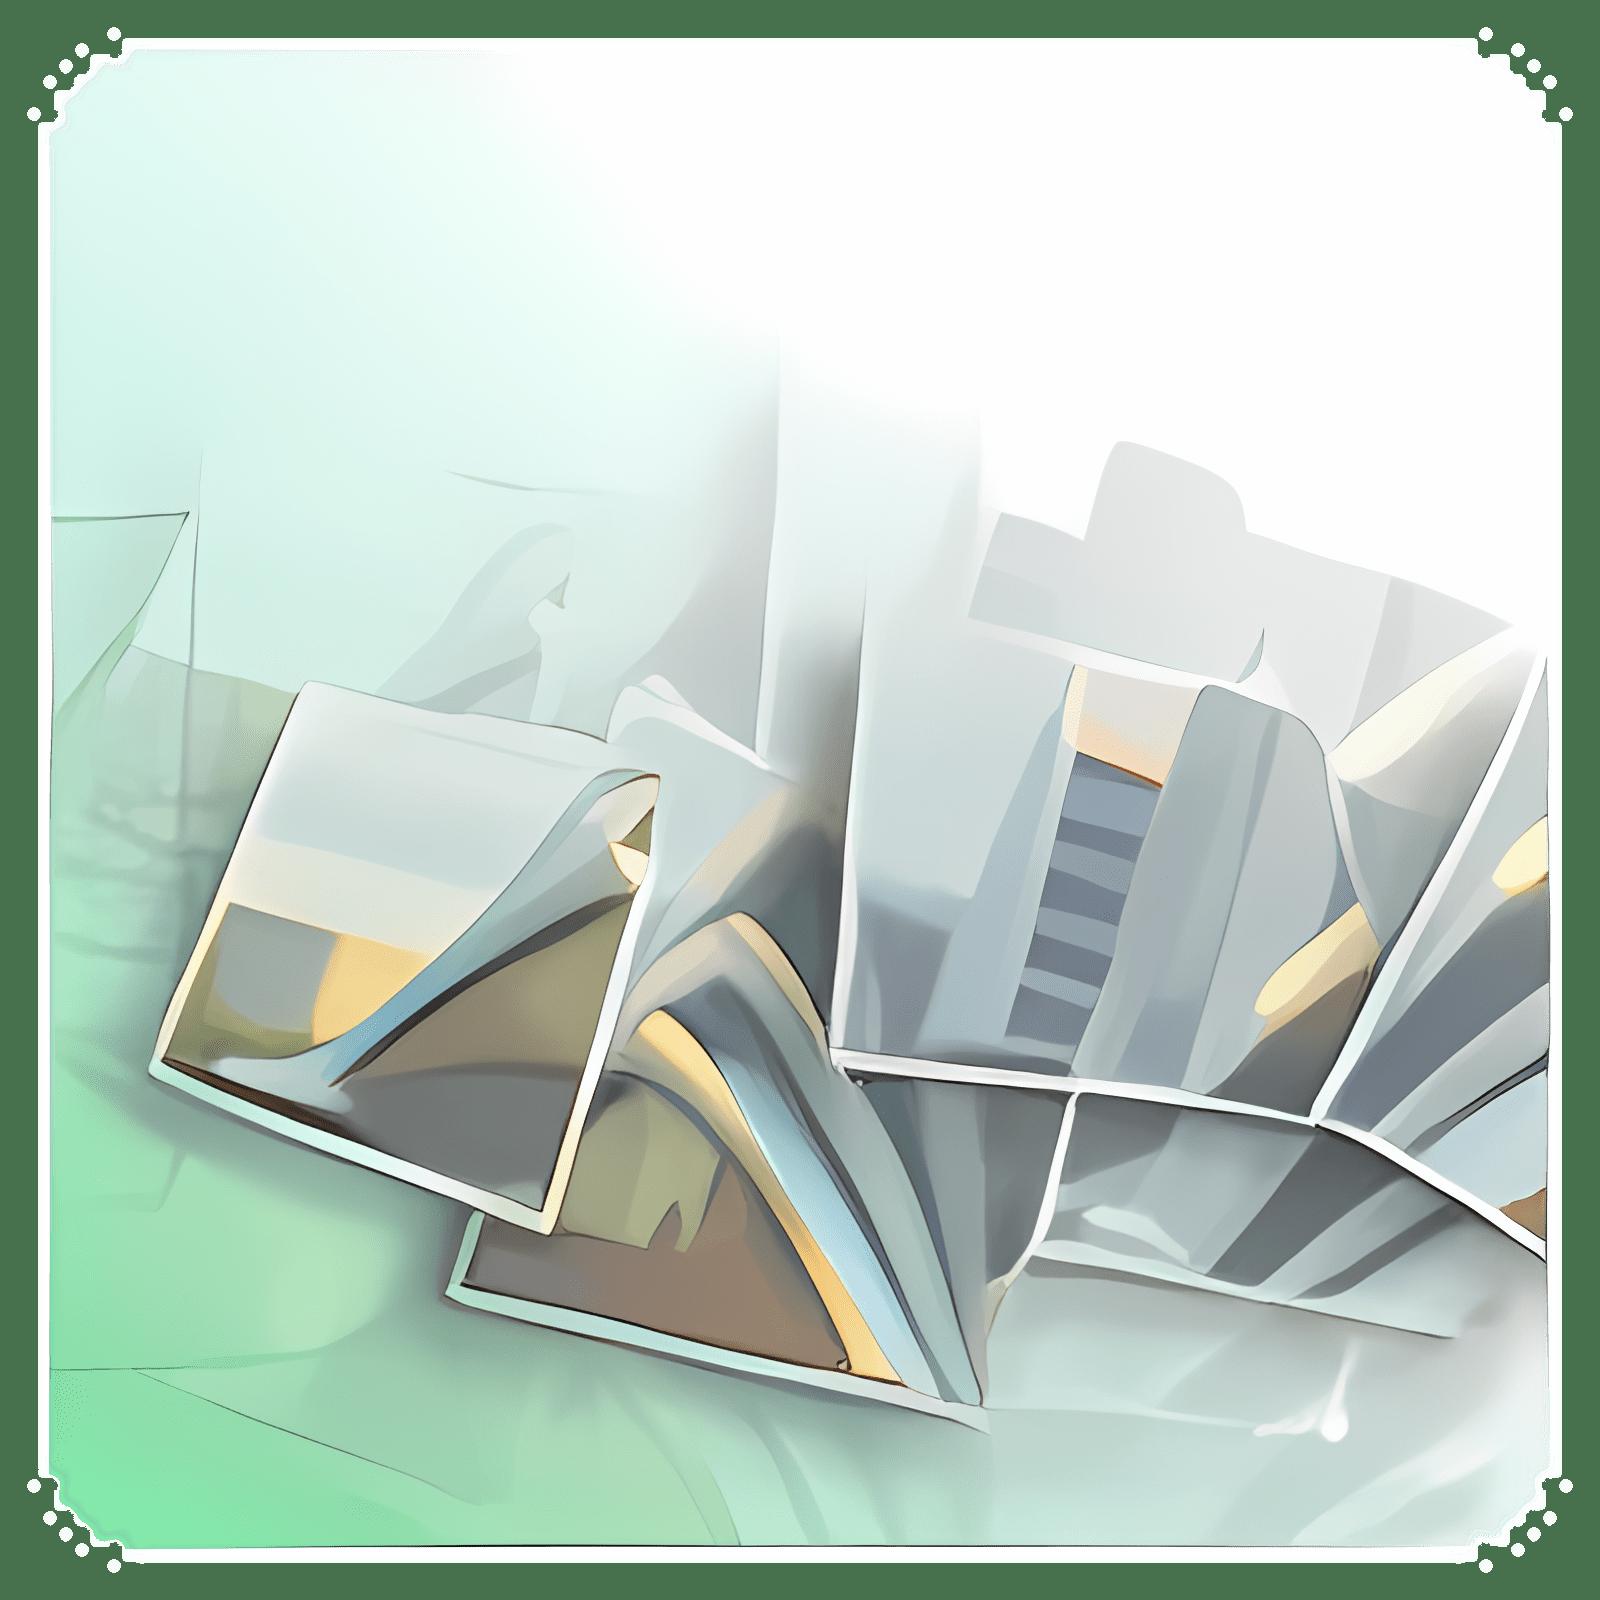 Autodesk Stitcher